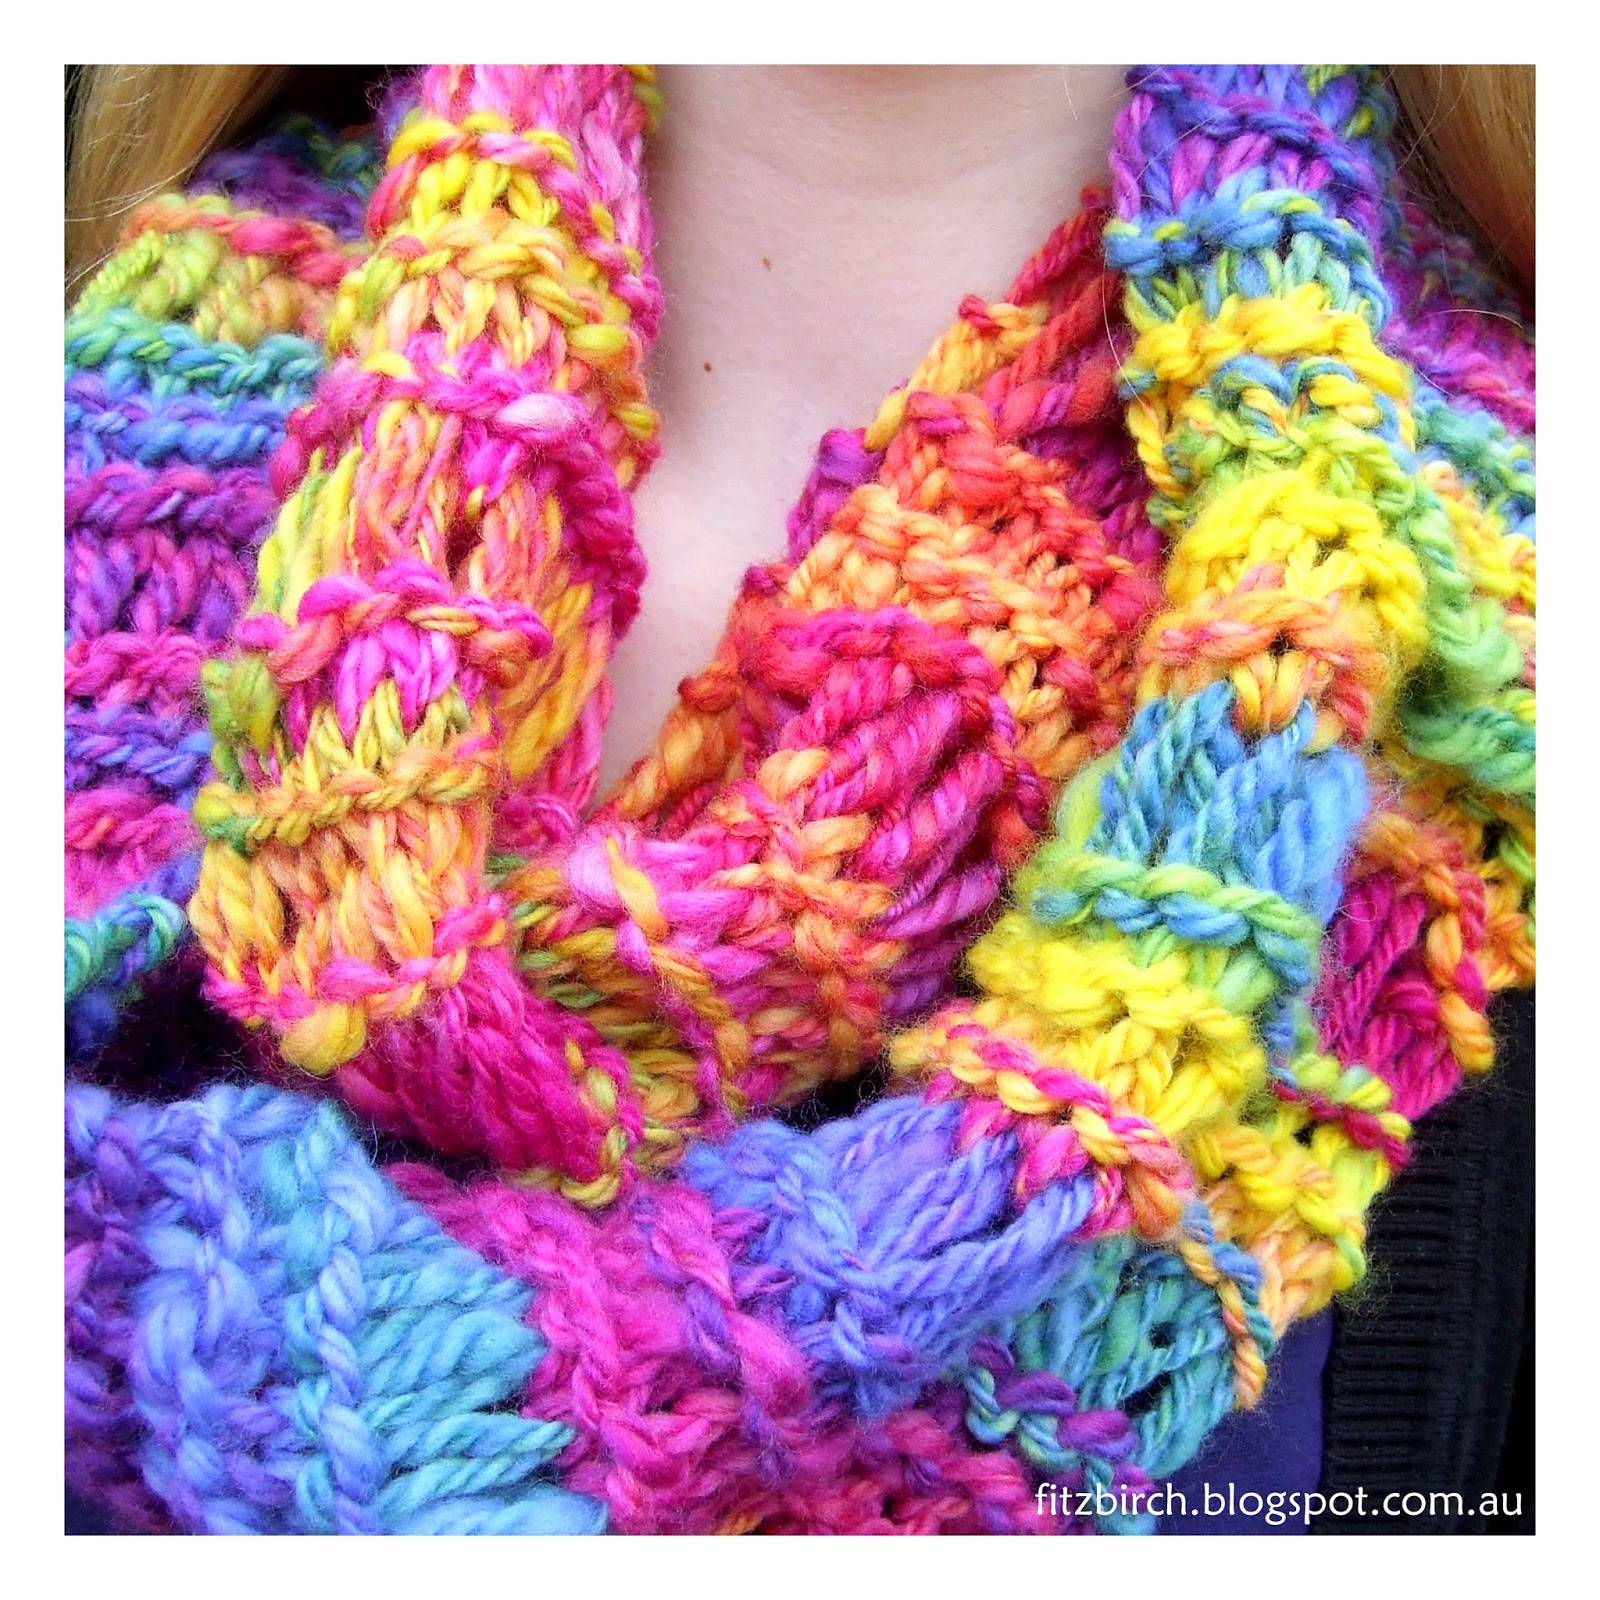 Knit Scarf Pattern Homespun Yarn : FitzBirch Crafts: Homespun Cowl